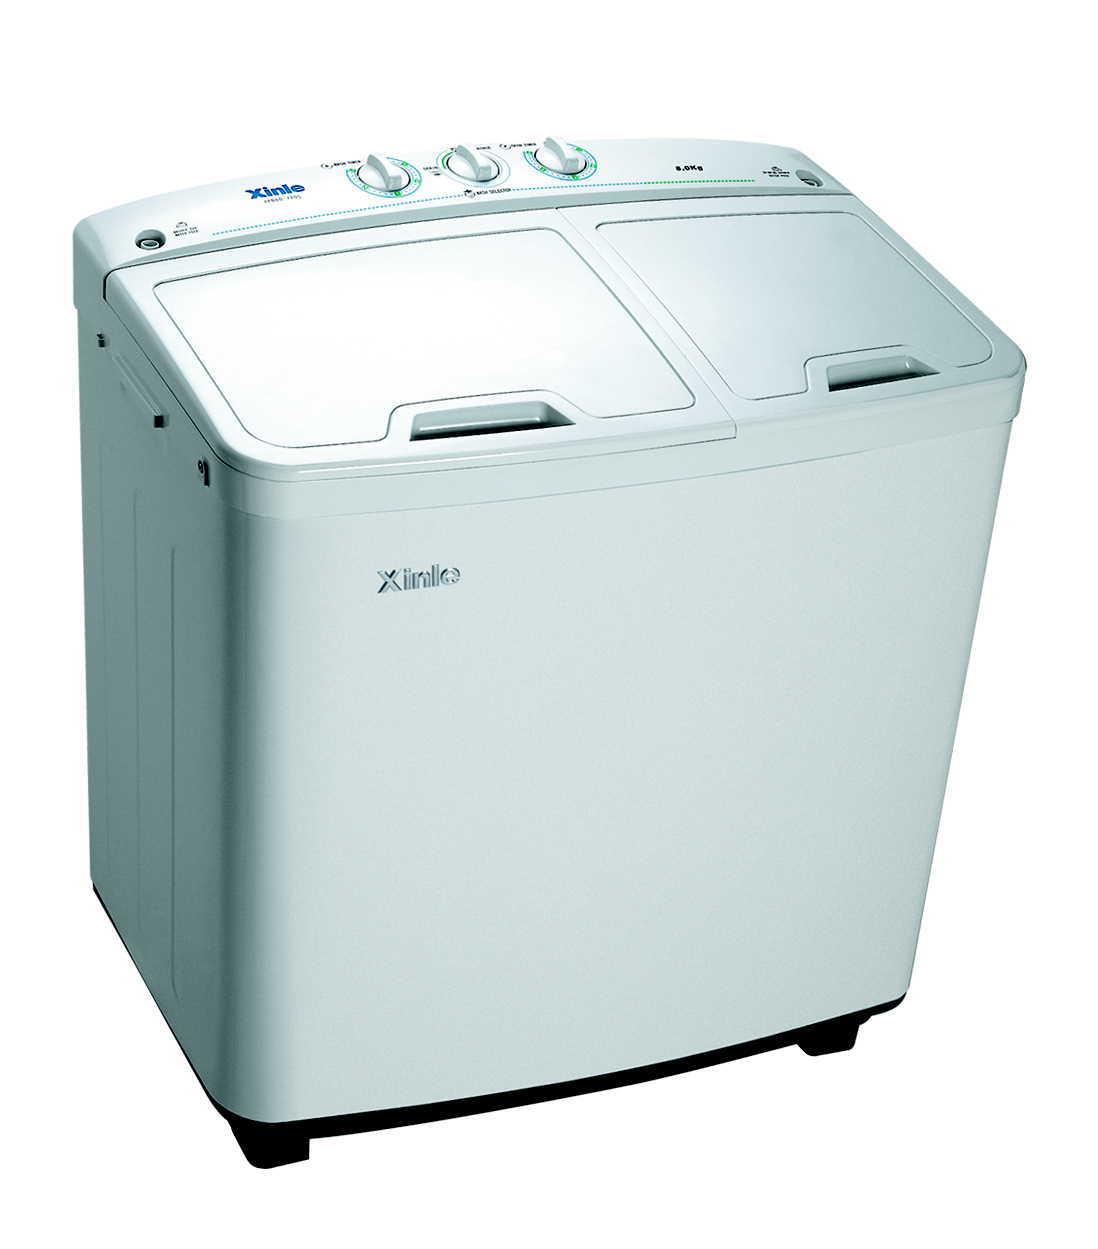 washing machine pictures